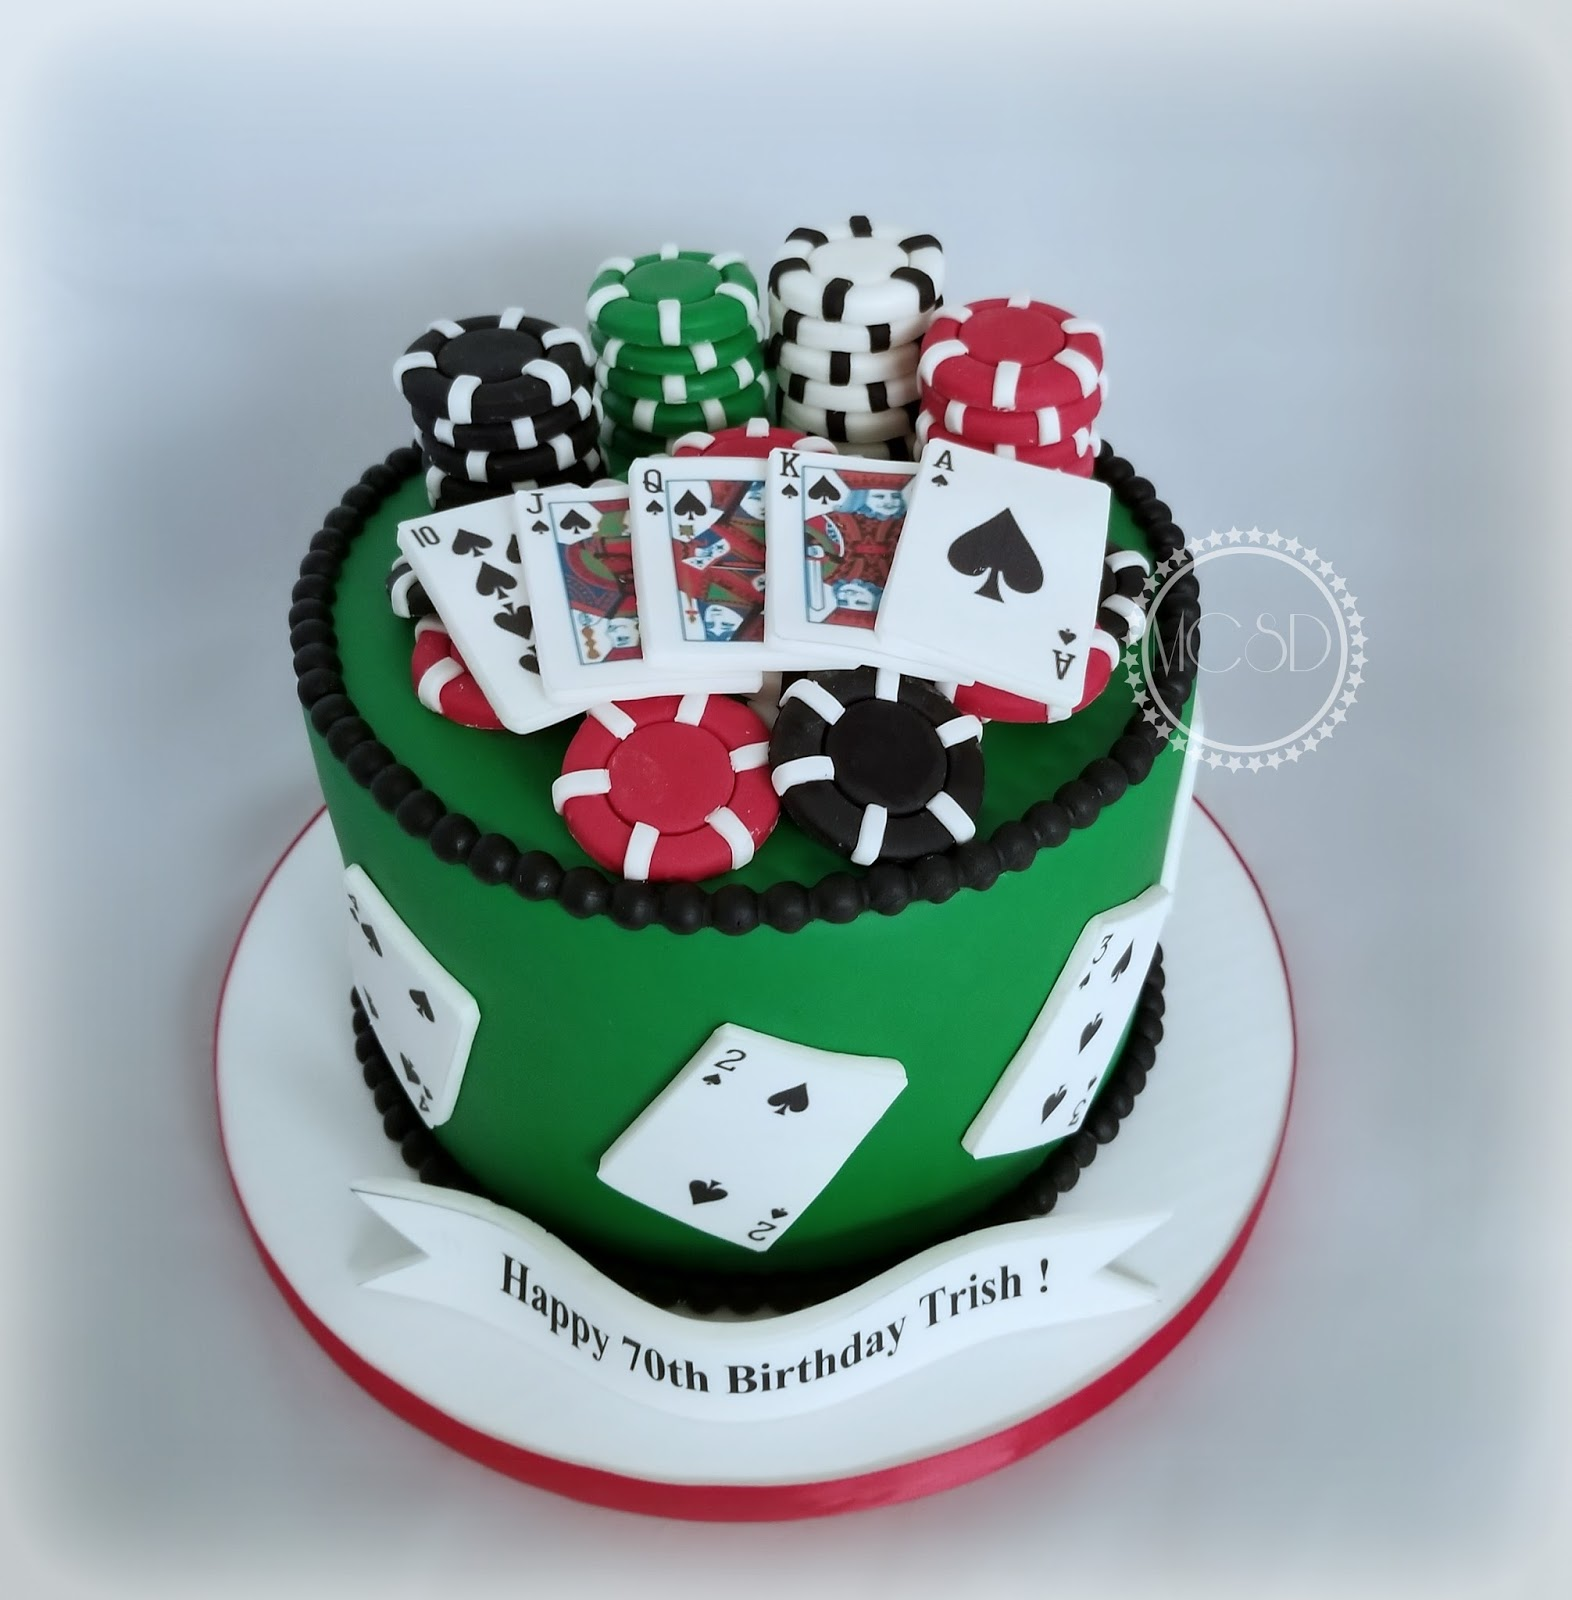 Miraculous Cakesbyzana Poker Themed Birthday Cake Funny Birthday Cards Online Unhofree Goldxyz